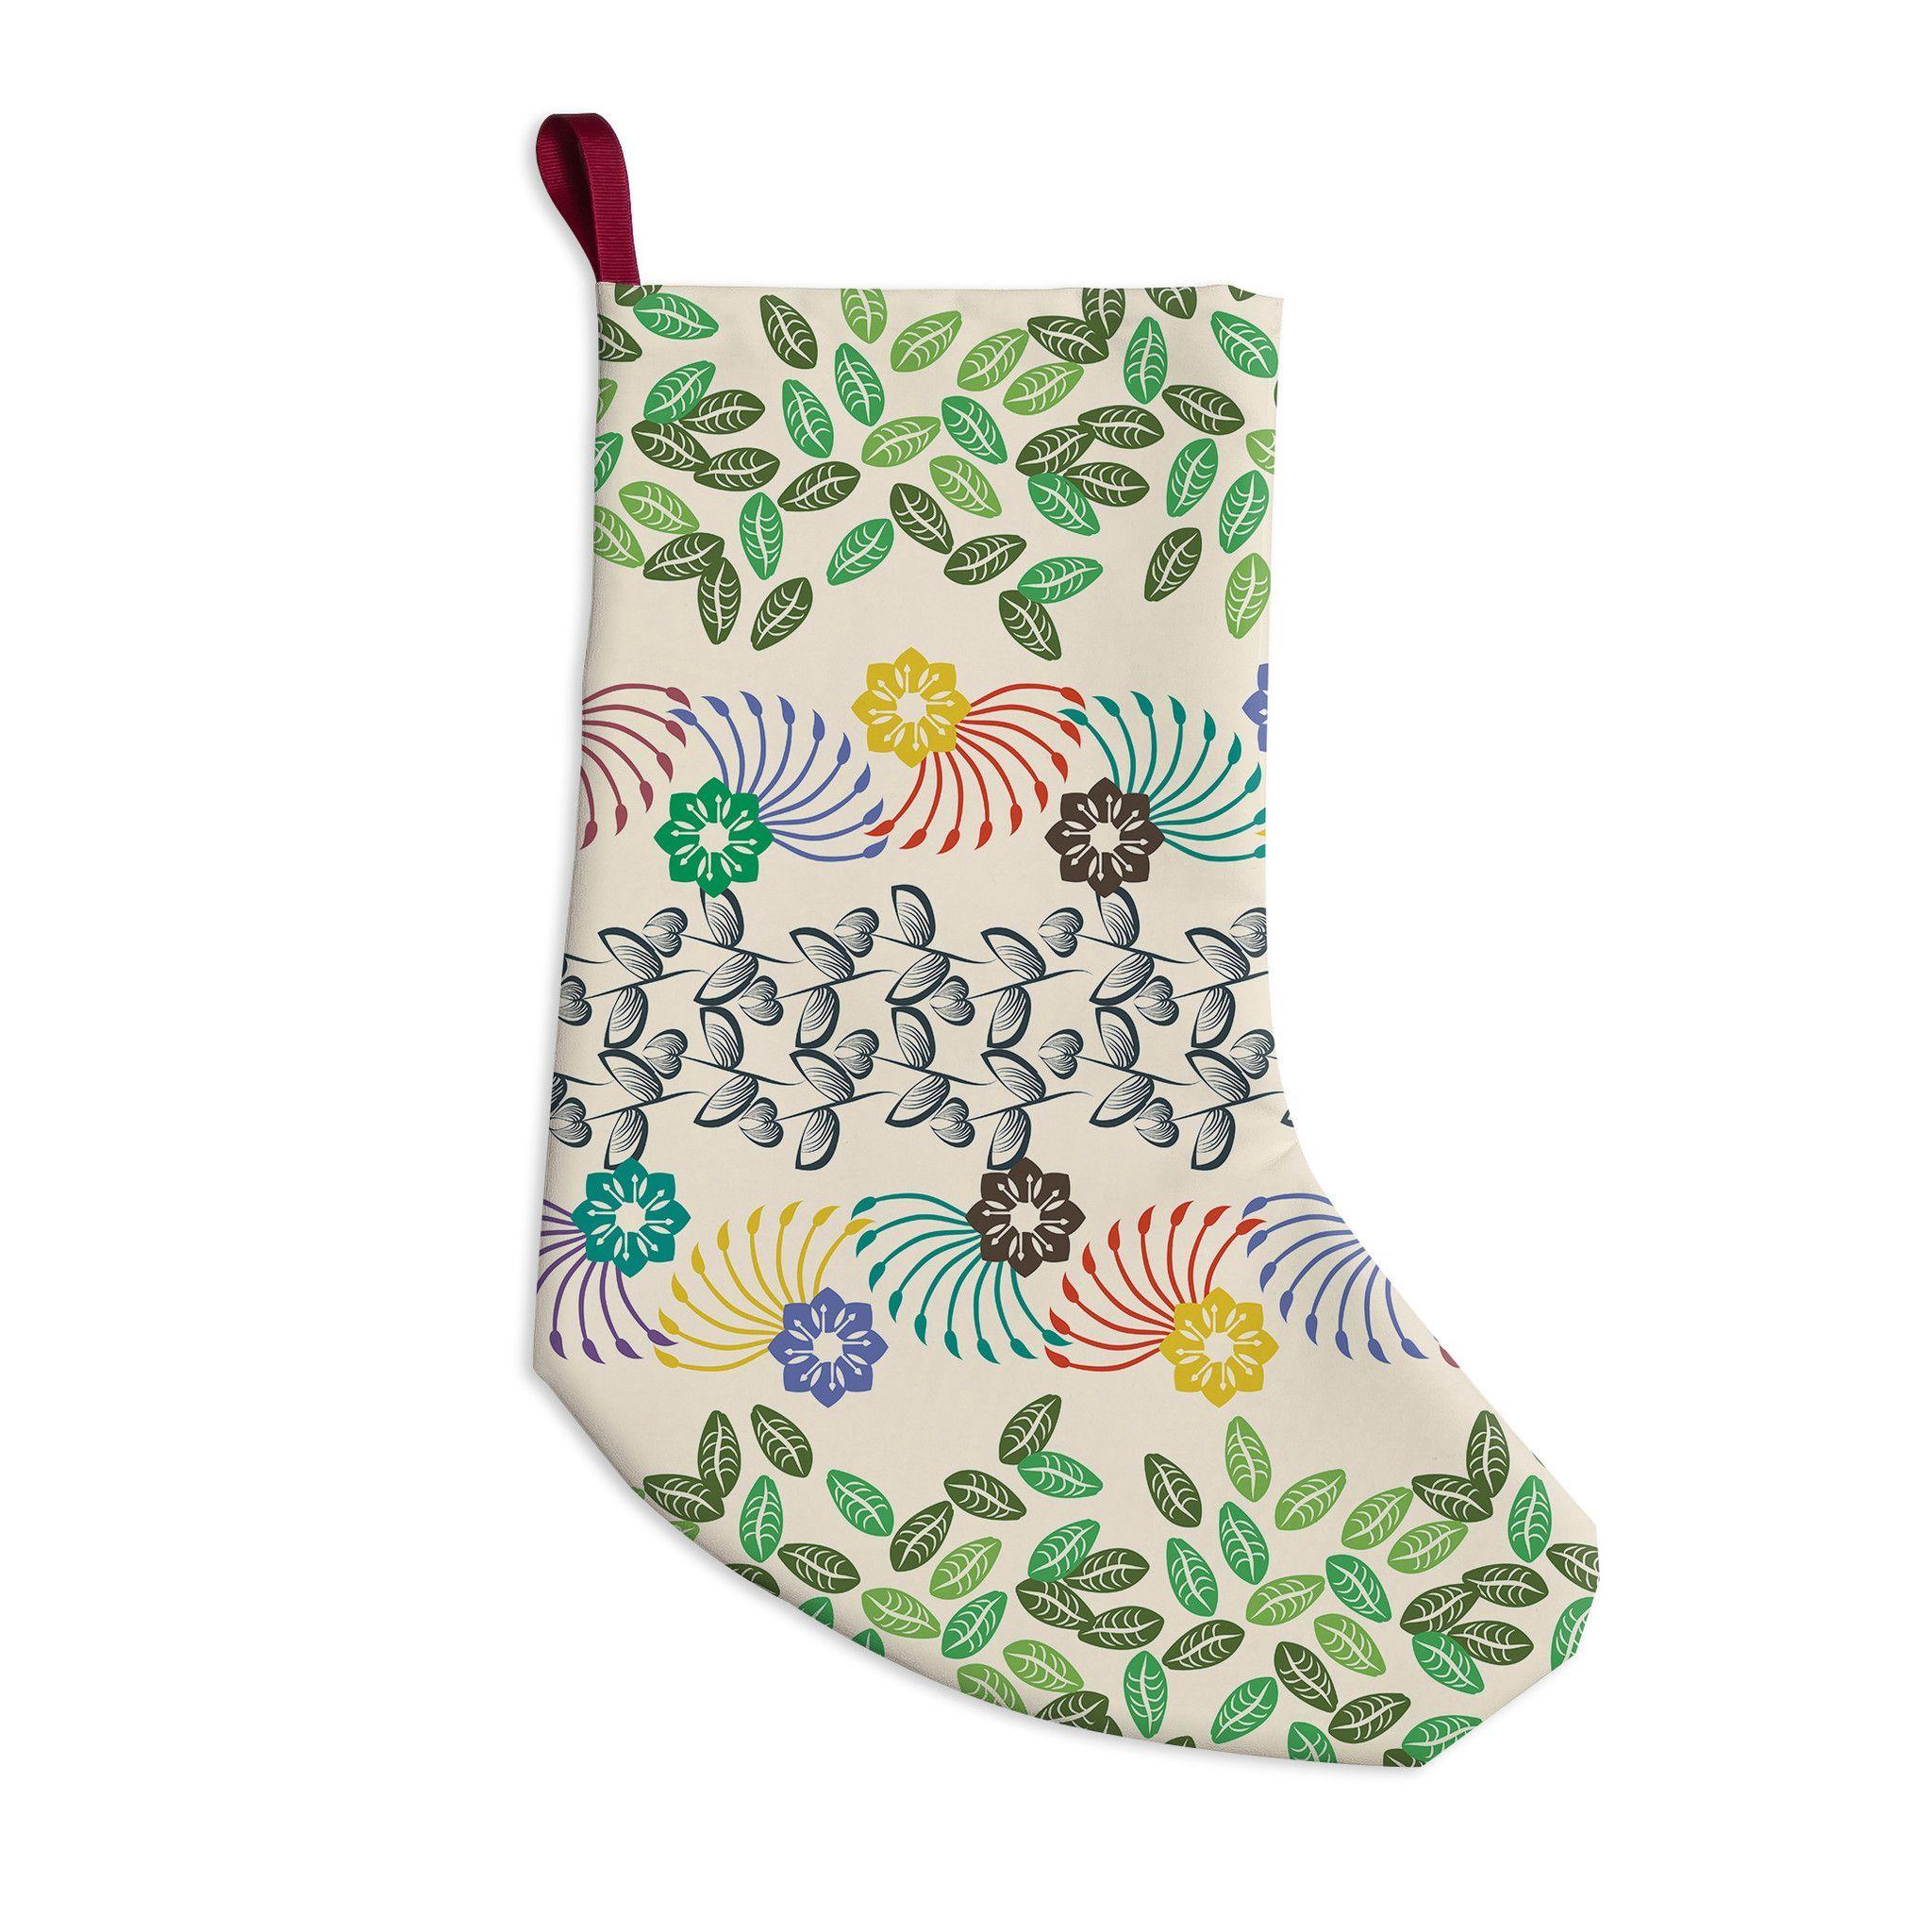 "Famenxt ""Flowers & Leaves Pattern"" Abstract Geometric Christmas Stocking"